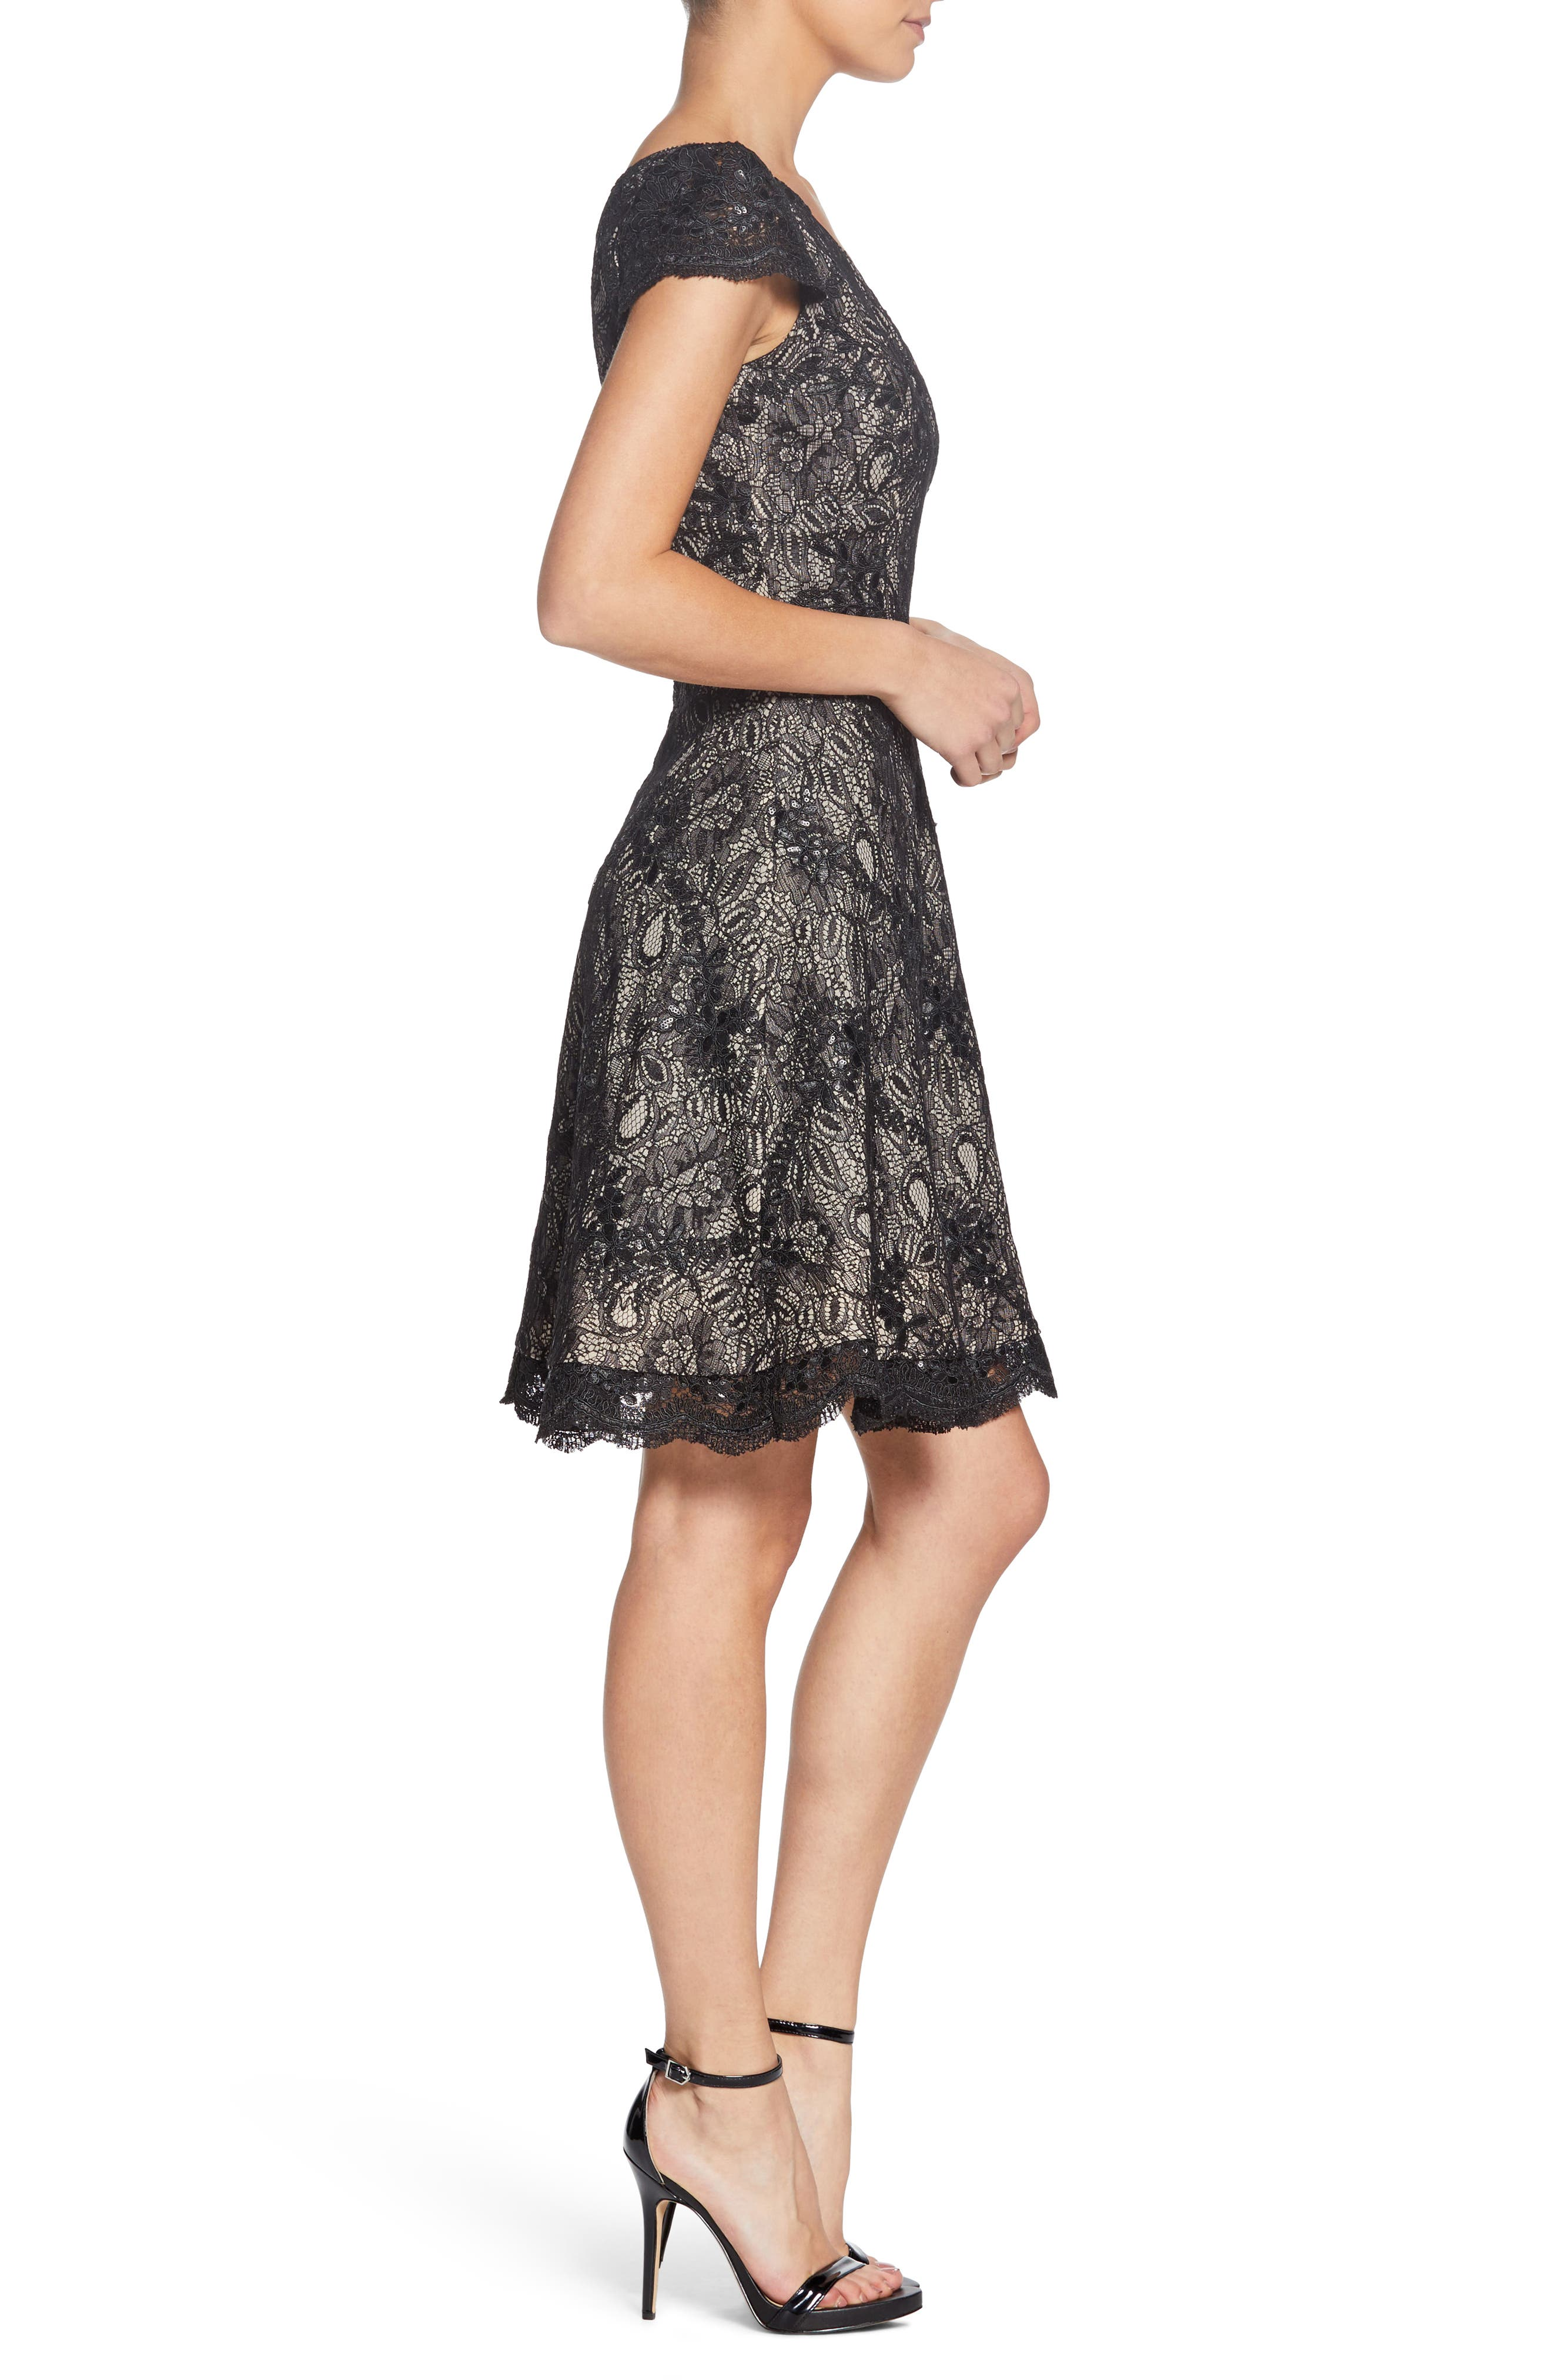 Alex One-Shoulder Cocktail Dress,                             Alternate thumbnail 3, color,                             BLACK/ NUDE